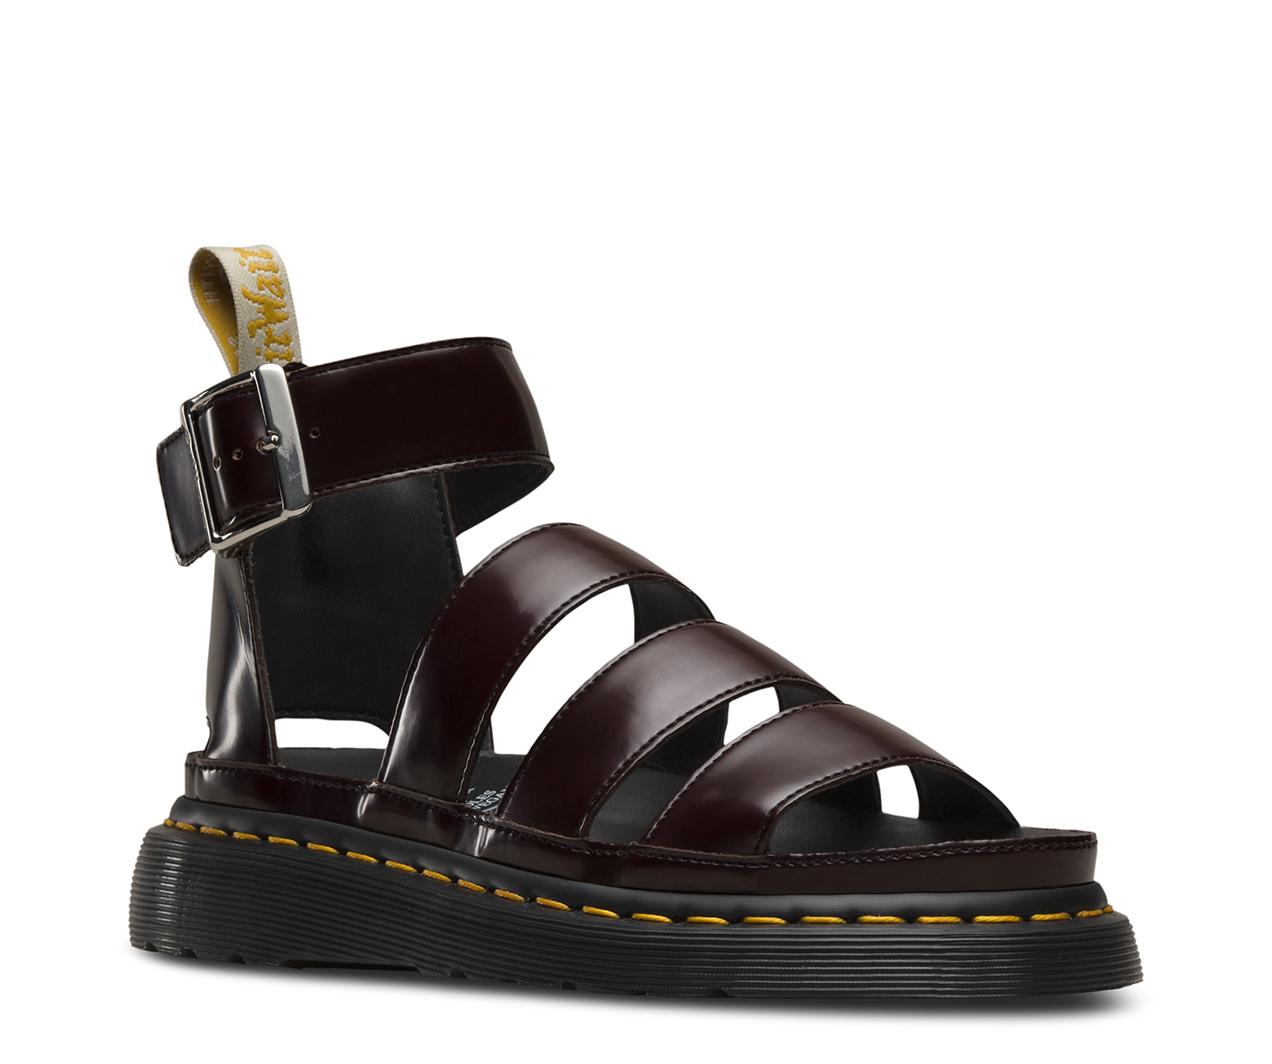 Doctor Comfort Shoes Uk